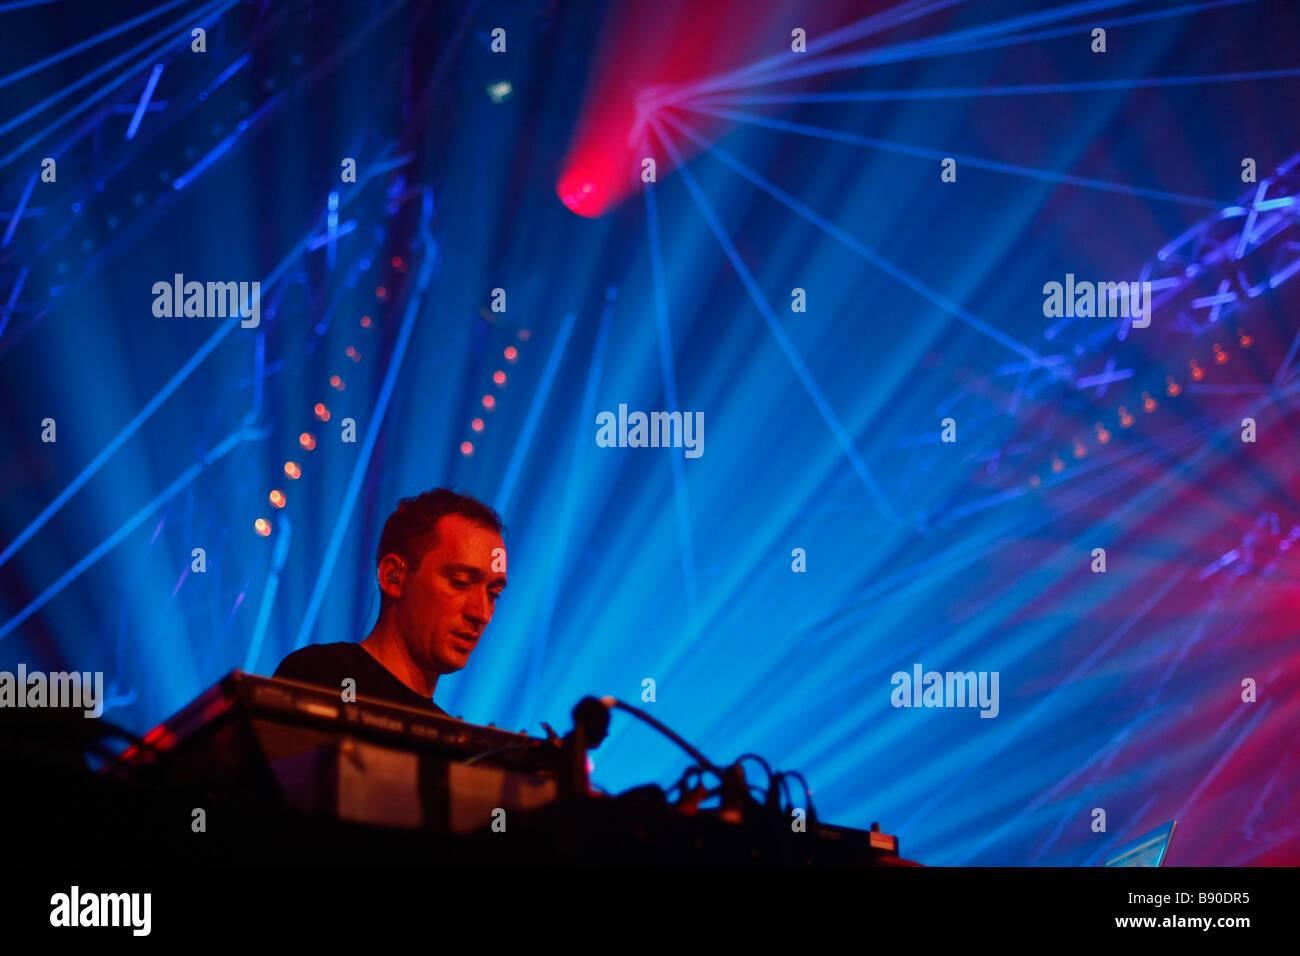 Live performance of DJ Paul van Dyk at Trance Energy 2009 in the Jaarbeurs in the city Utrecht - Stock Image